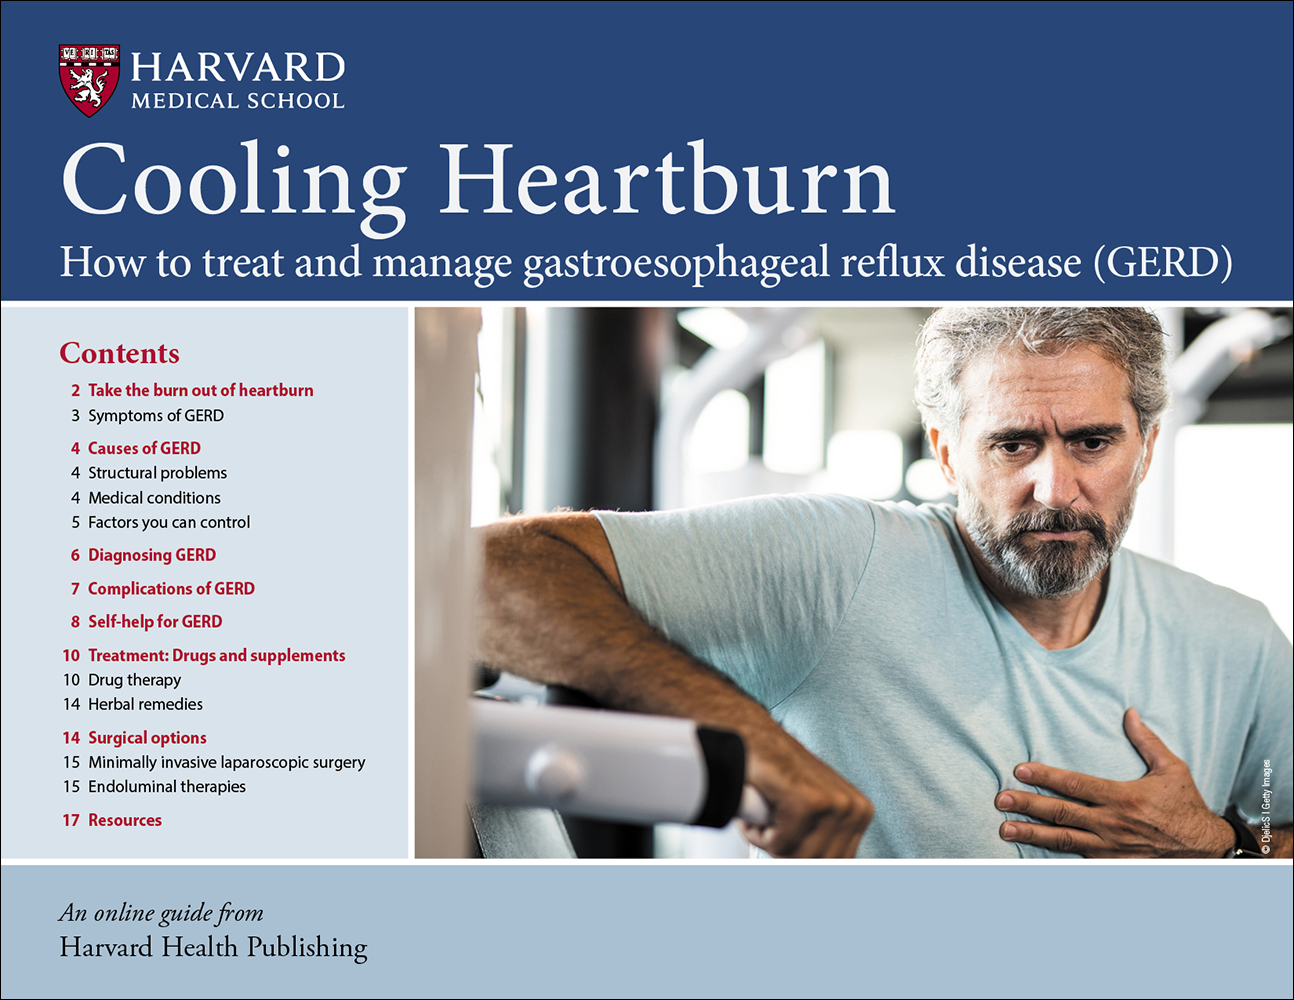 Cooling Heartburn